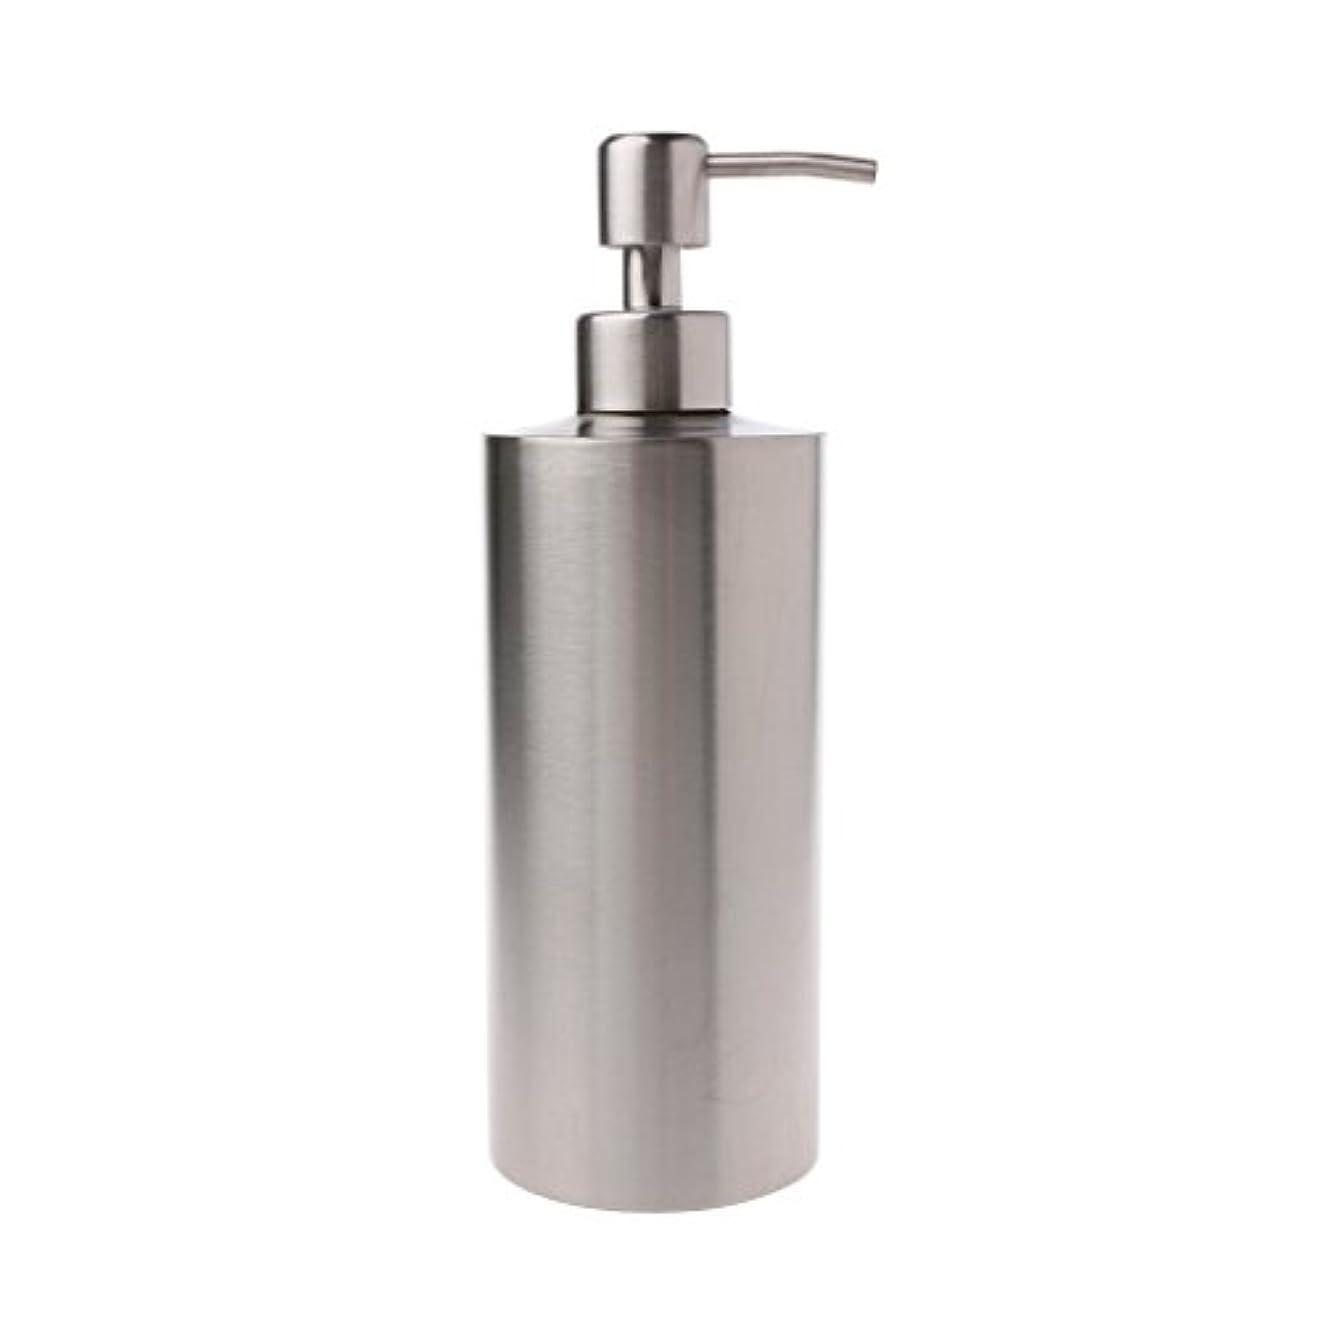 Lamdoo 304ステンレス鋼ポンプ液体石鹸ローションディスペンサーボトルキッチンバスルーム